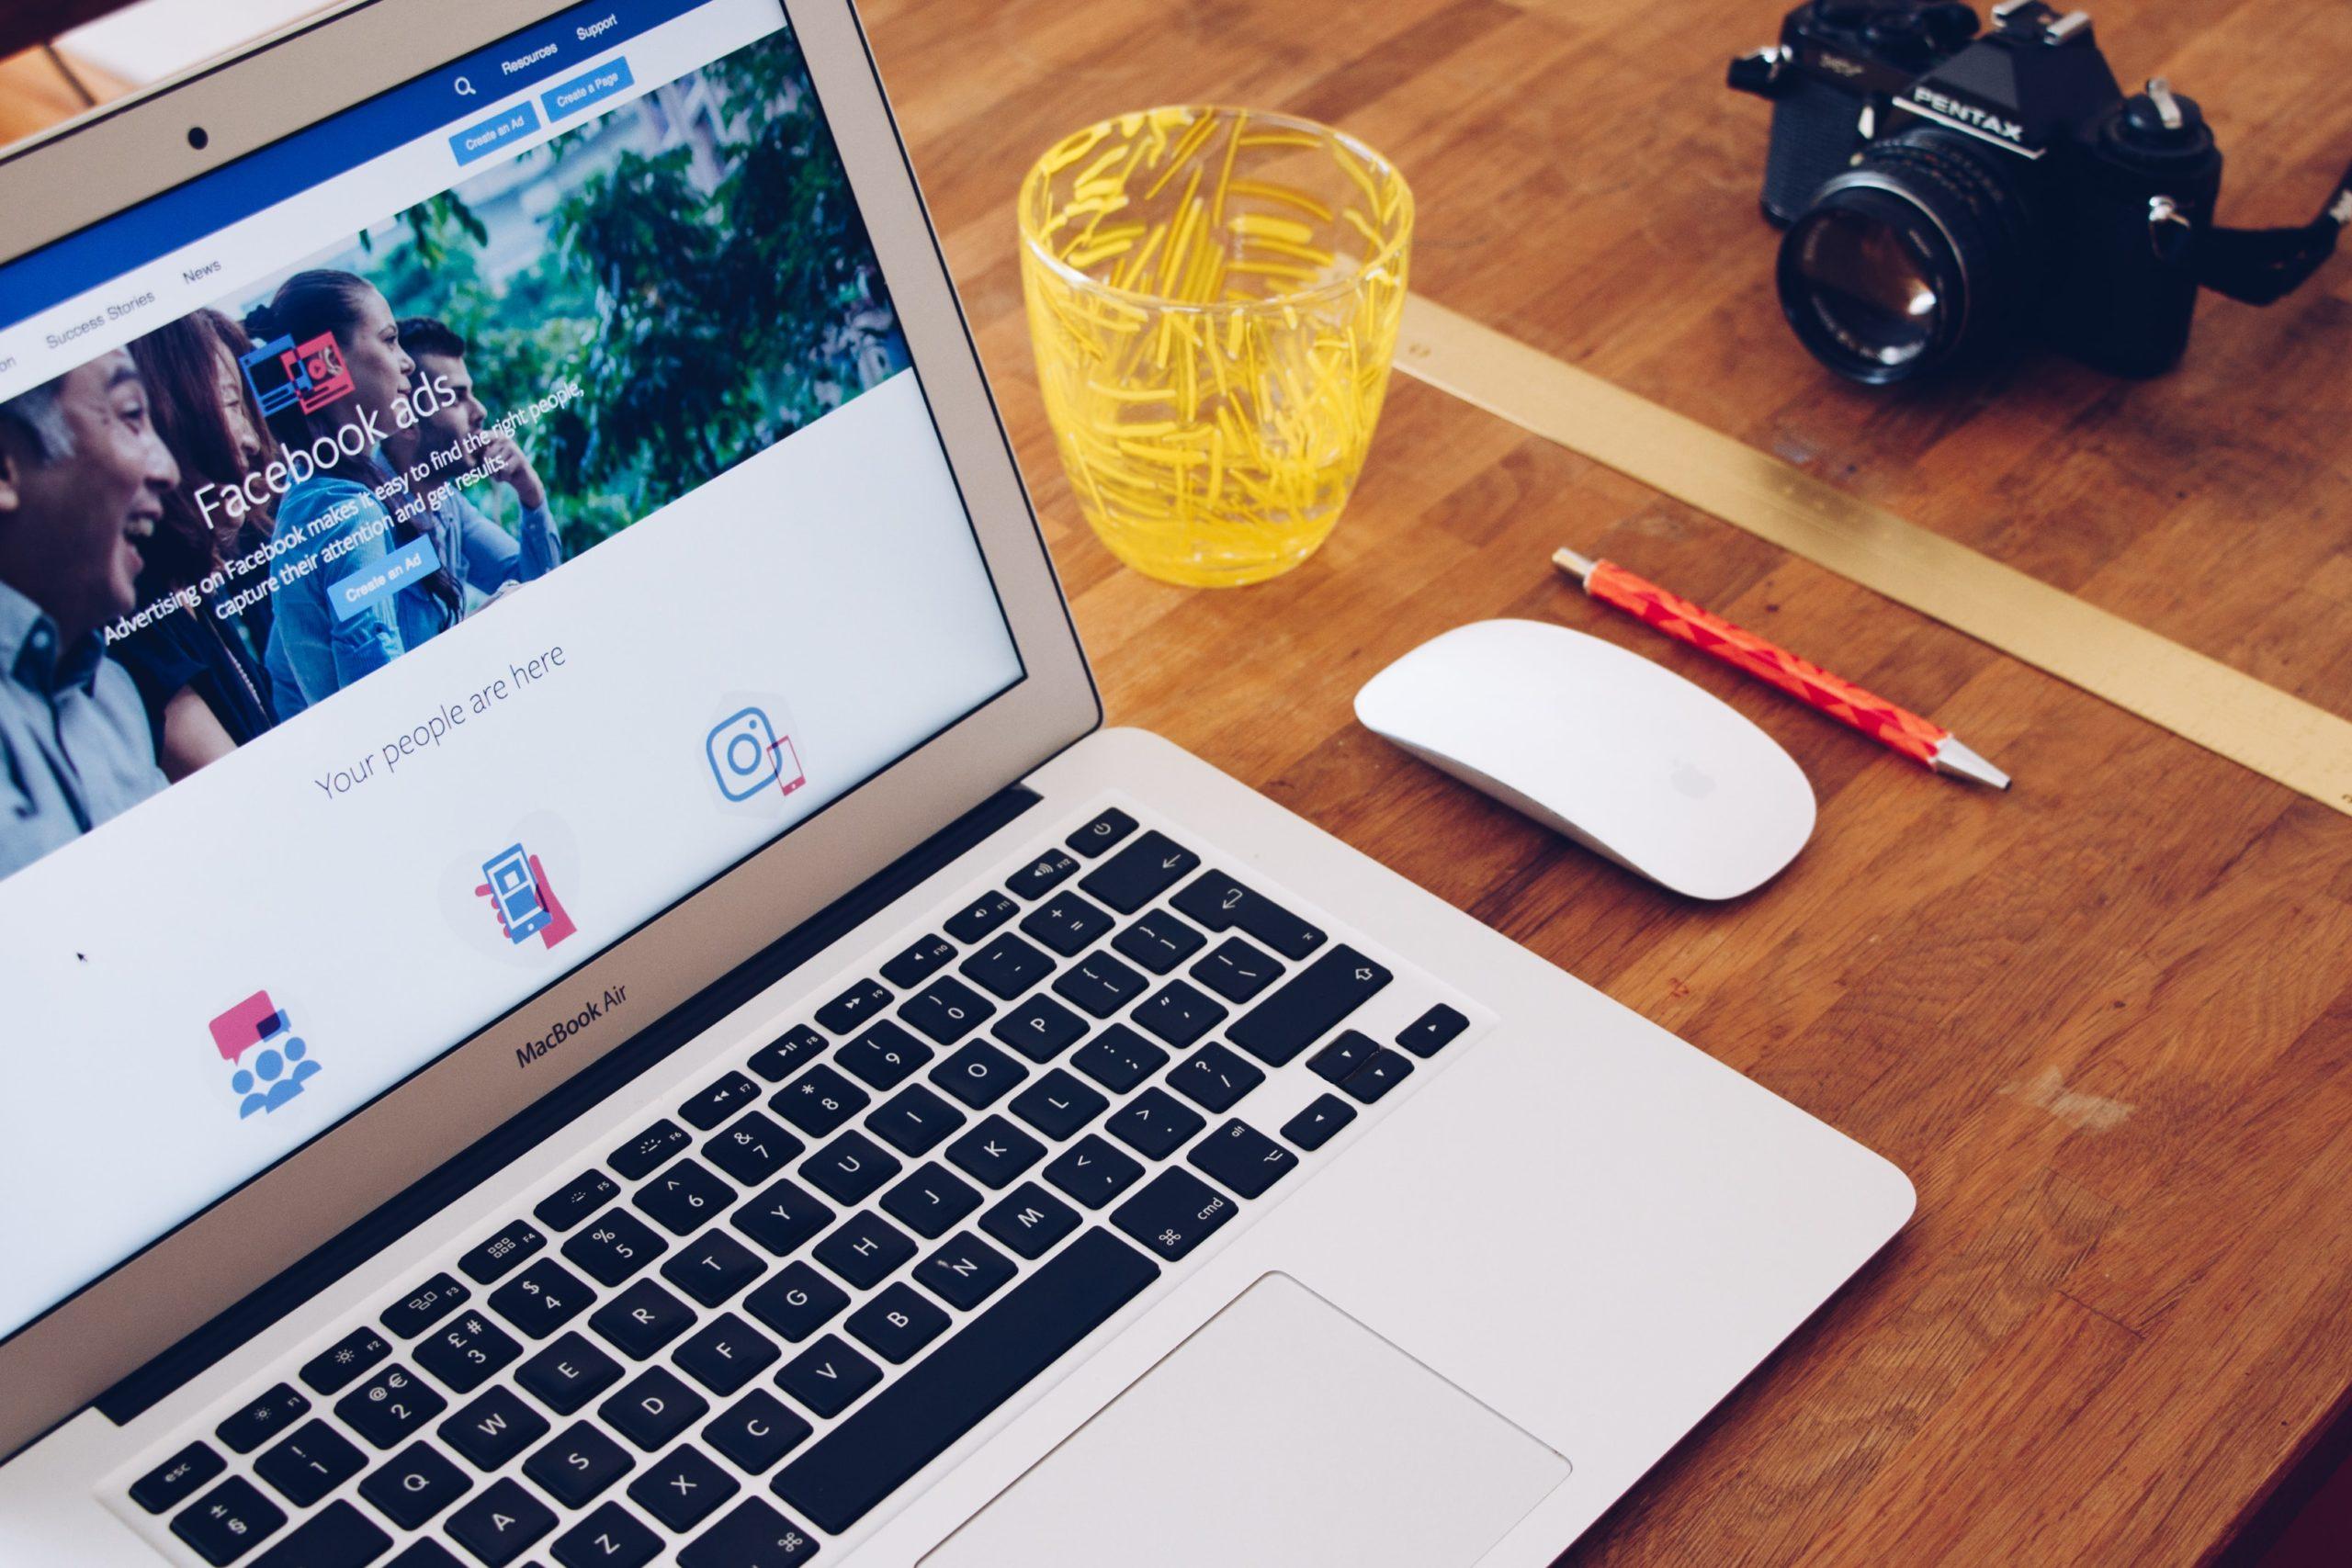 Facebook ads login on laptop